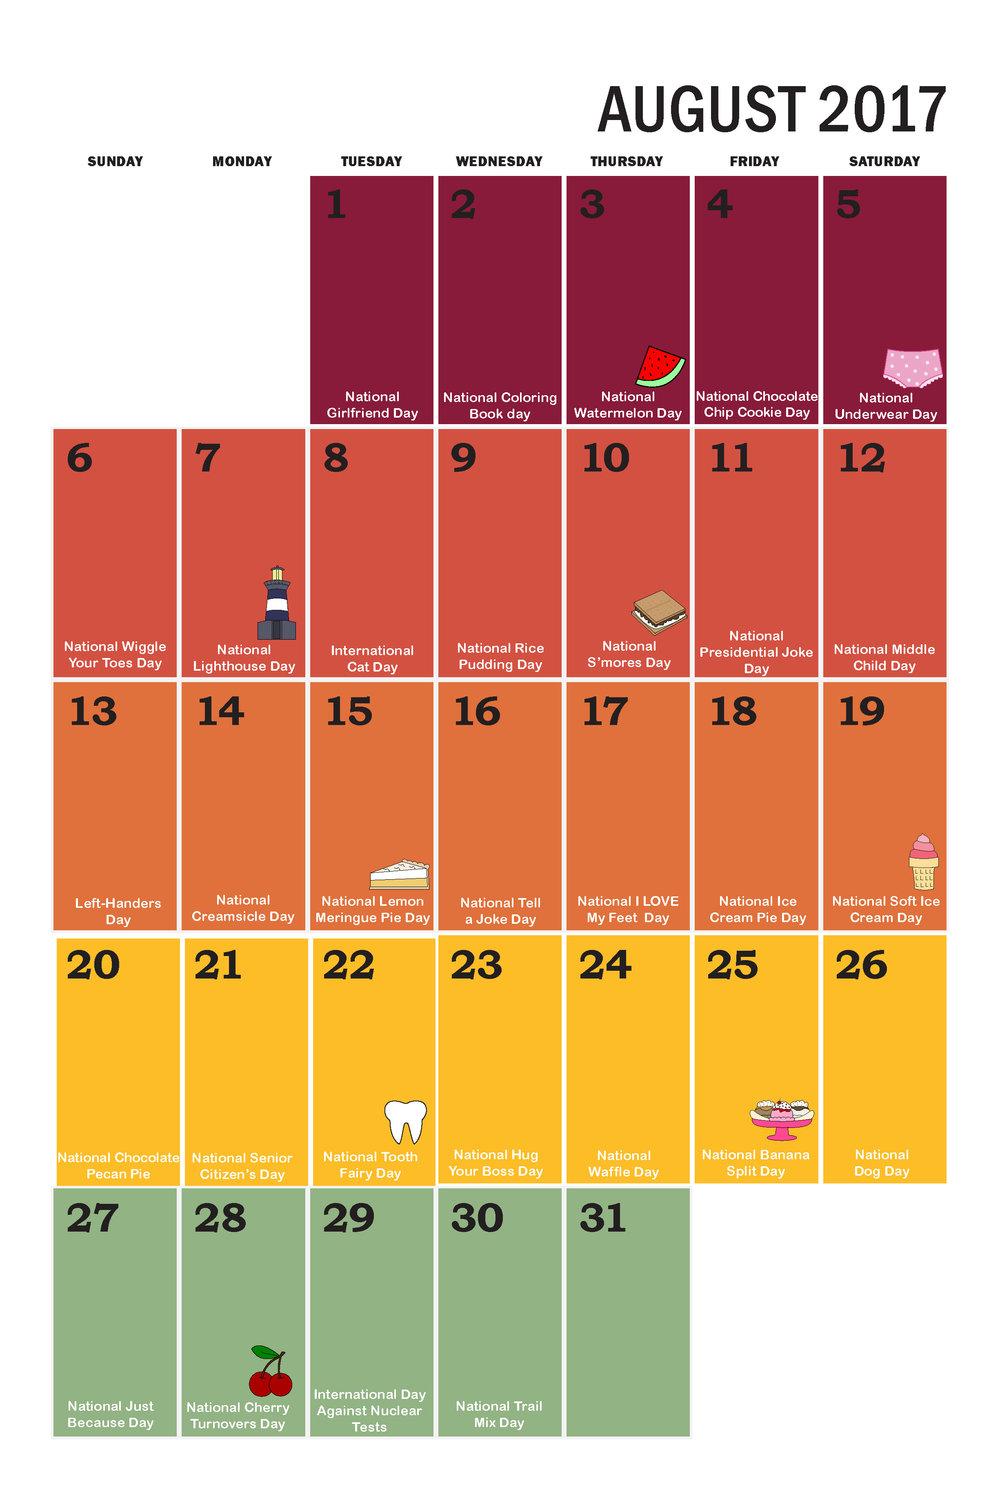 Sammy Kuck August Calendar.jpg